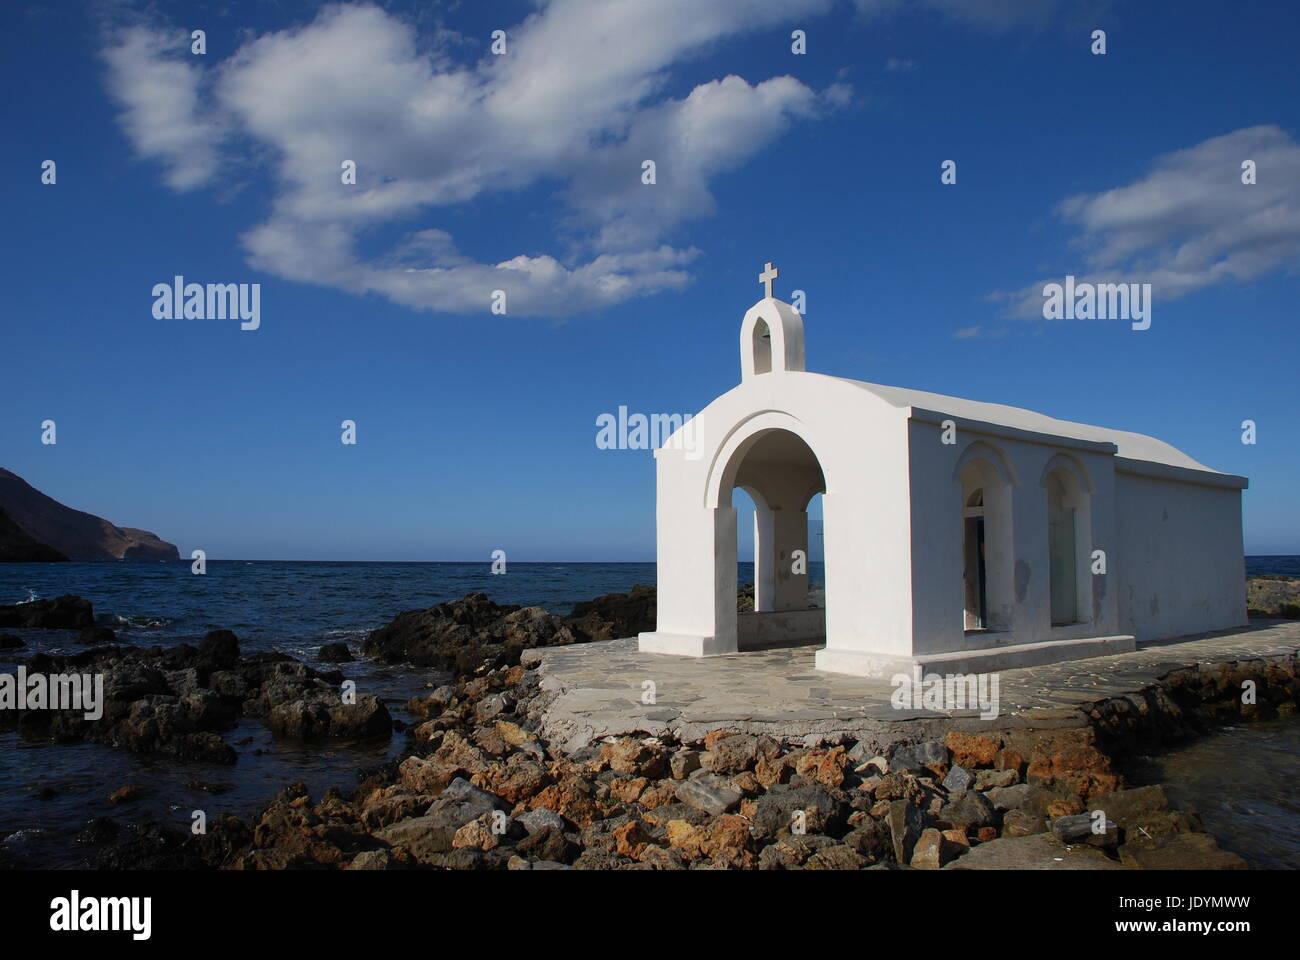 tourism cross - Stock Image